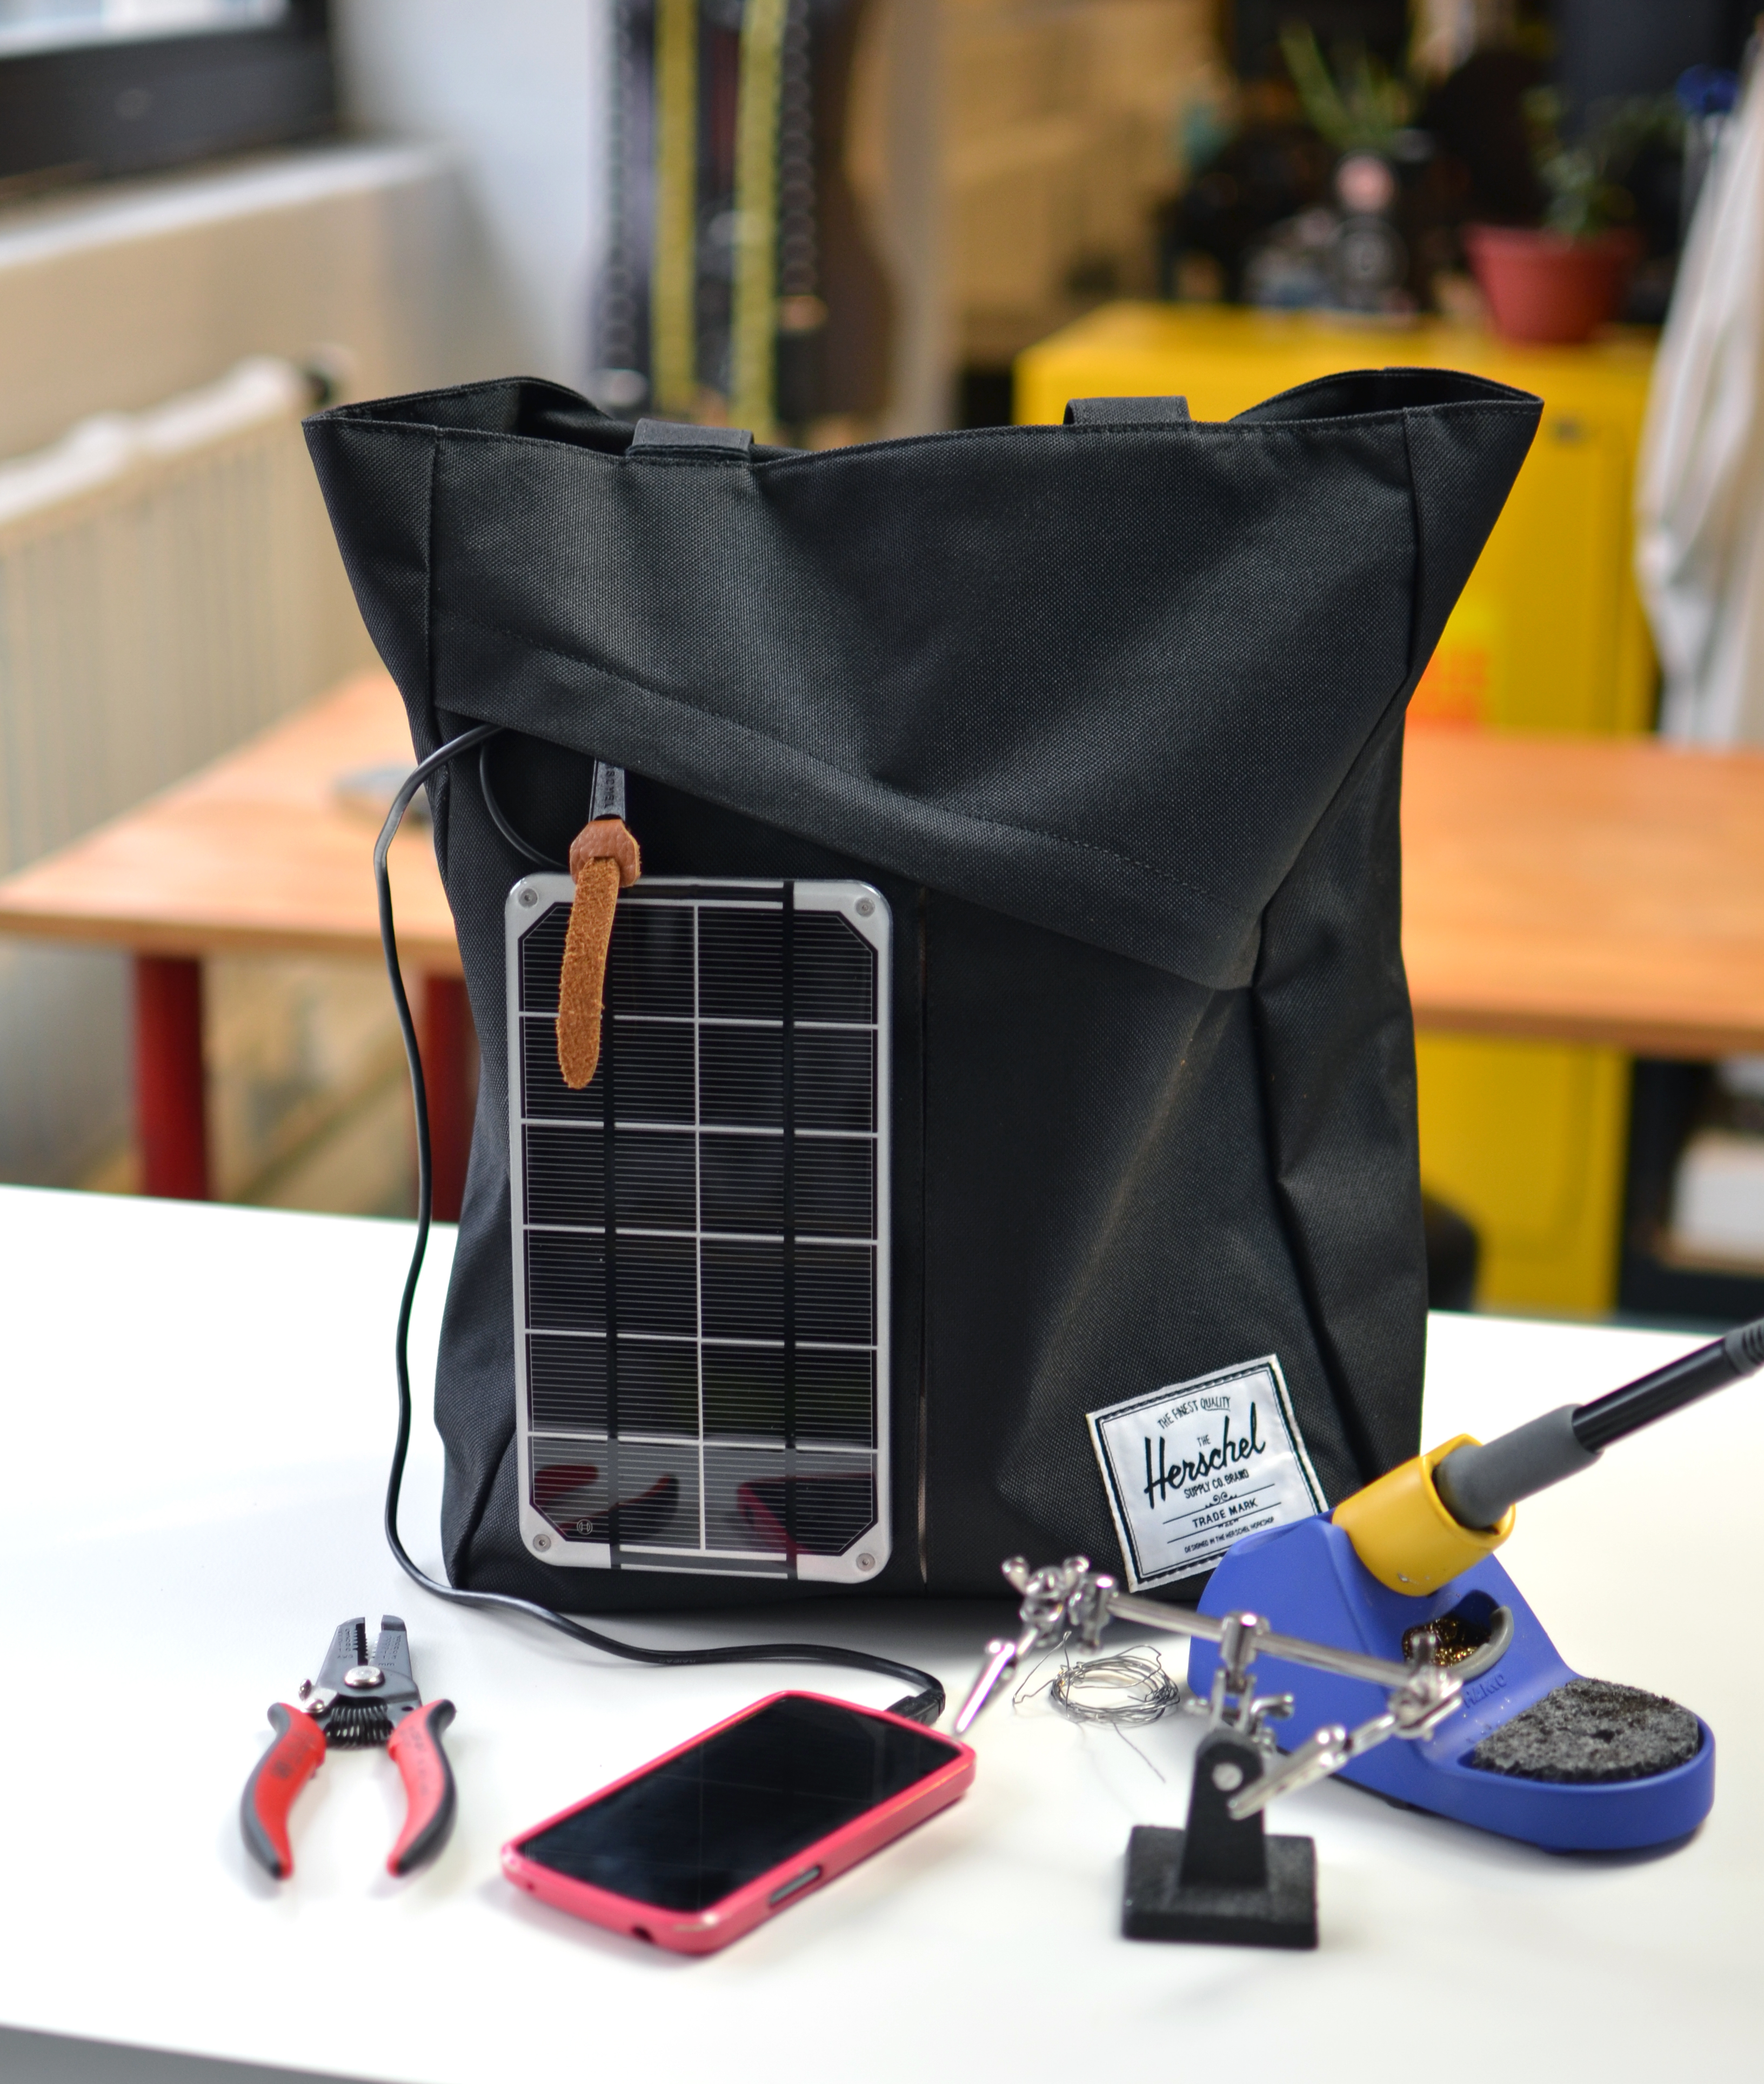 projects_solar-bag-minty-boost-adafruit.jpg